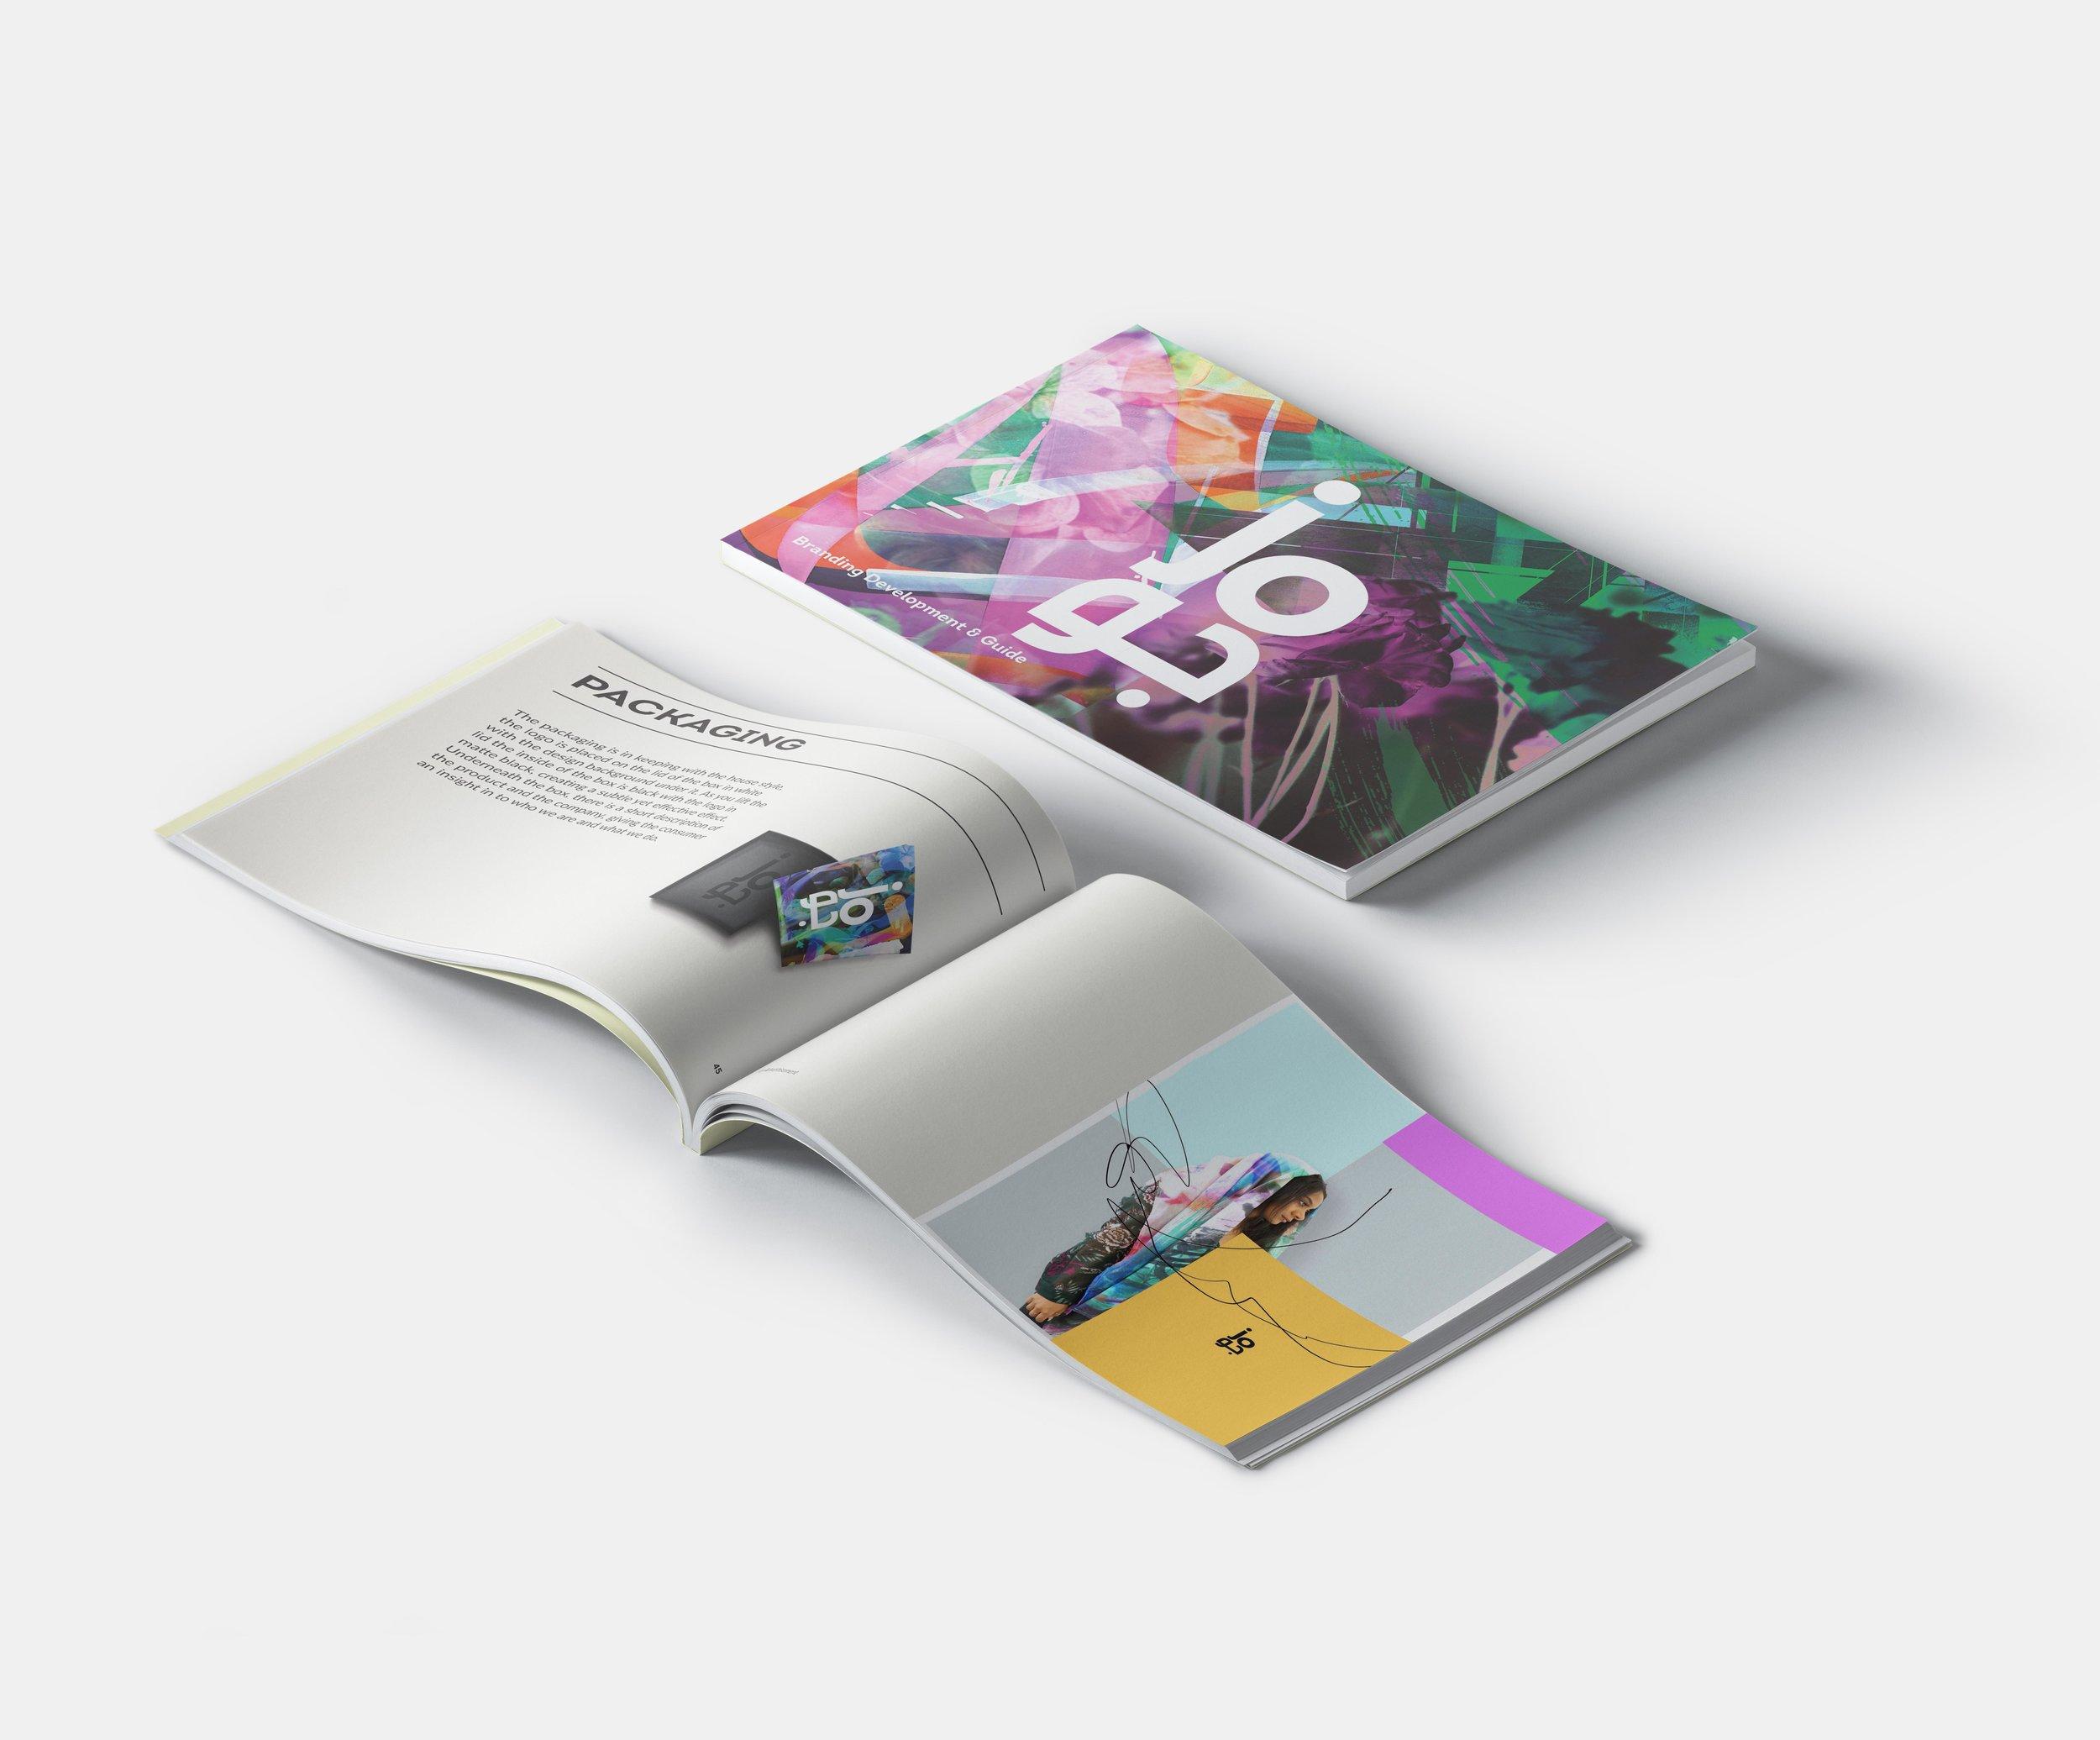 A4-Landscape-Magazine-Mockup-vol2.jpg